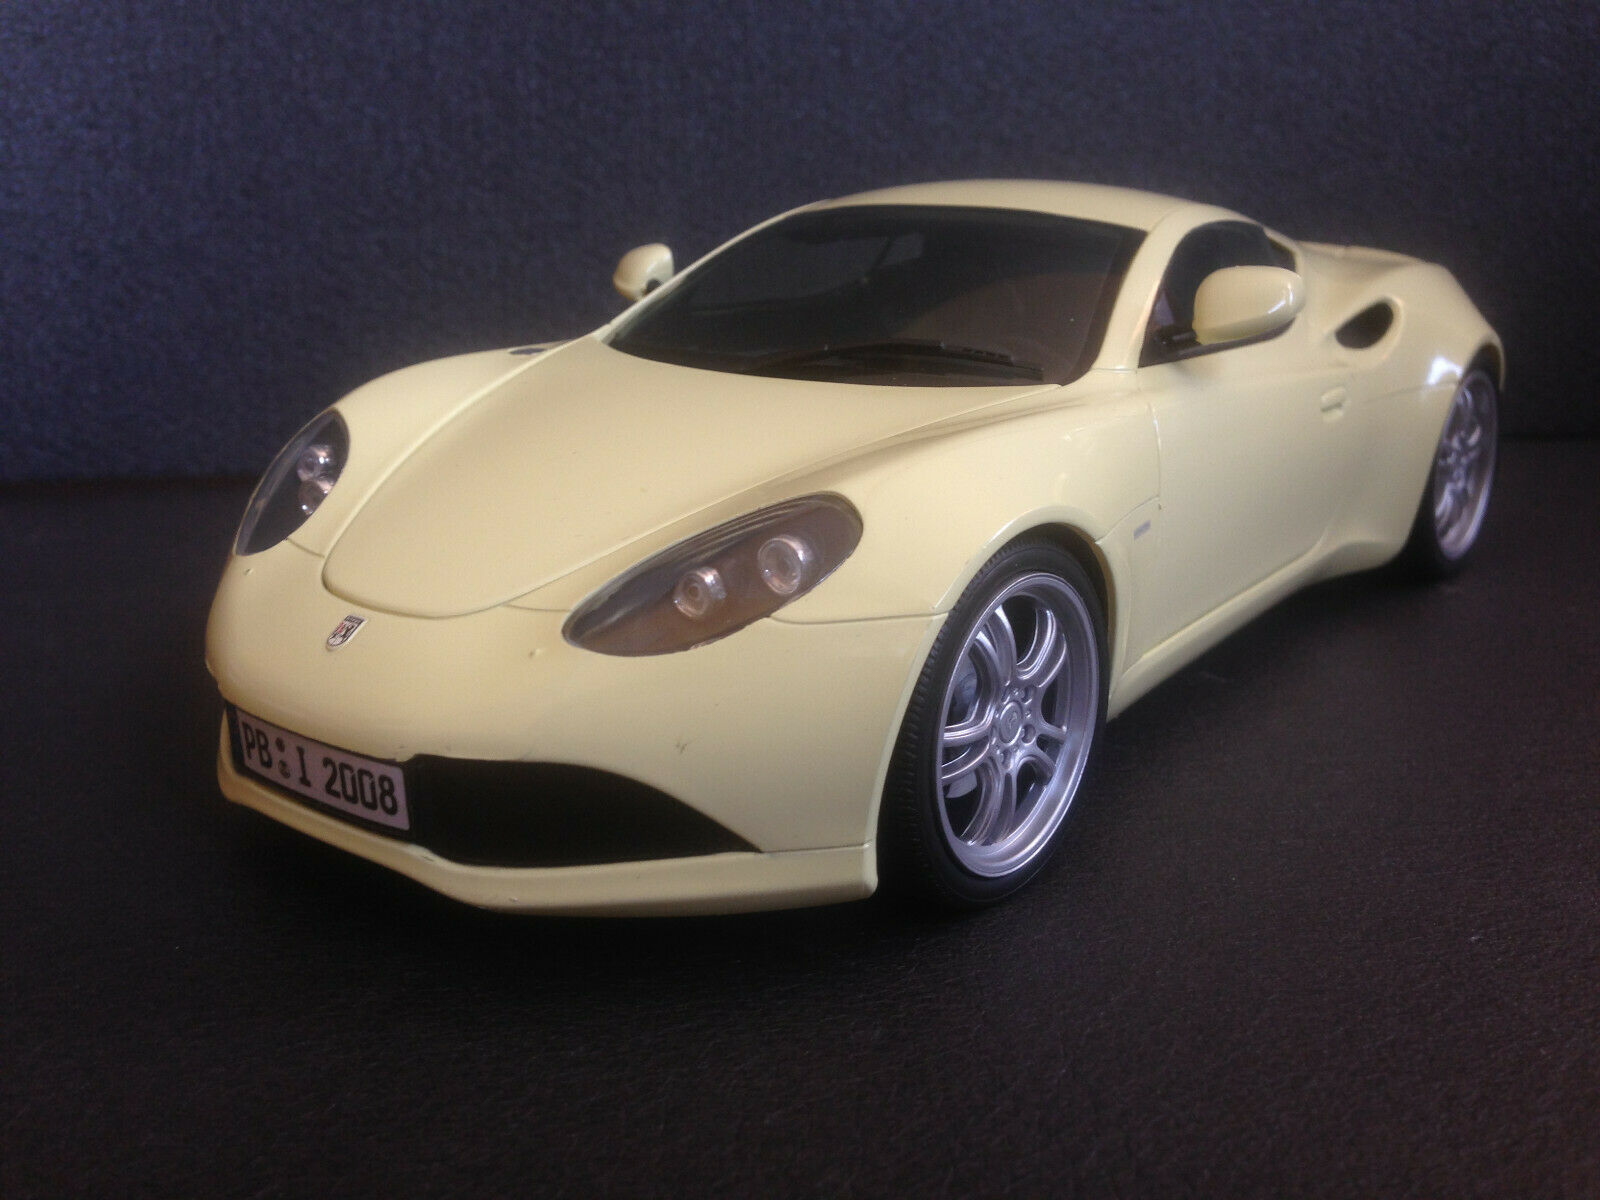 Artega GT Intro 2008 vanillegelb Revell Composite sehr selten neu in OVP 1 18